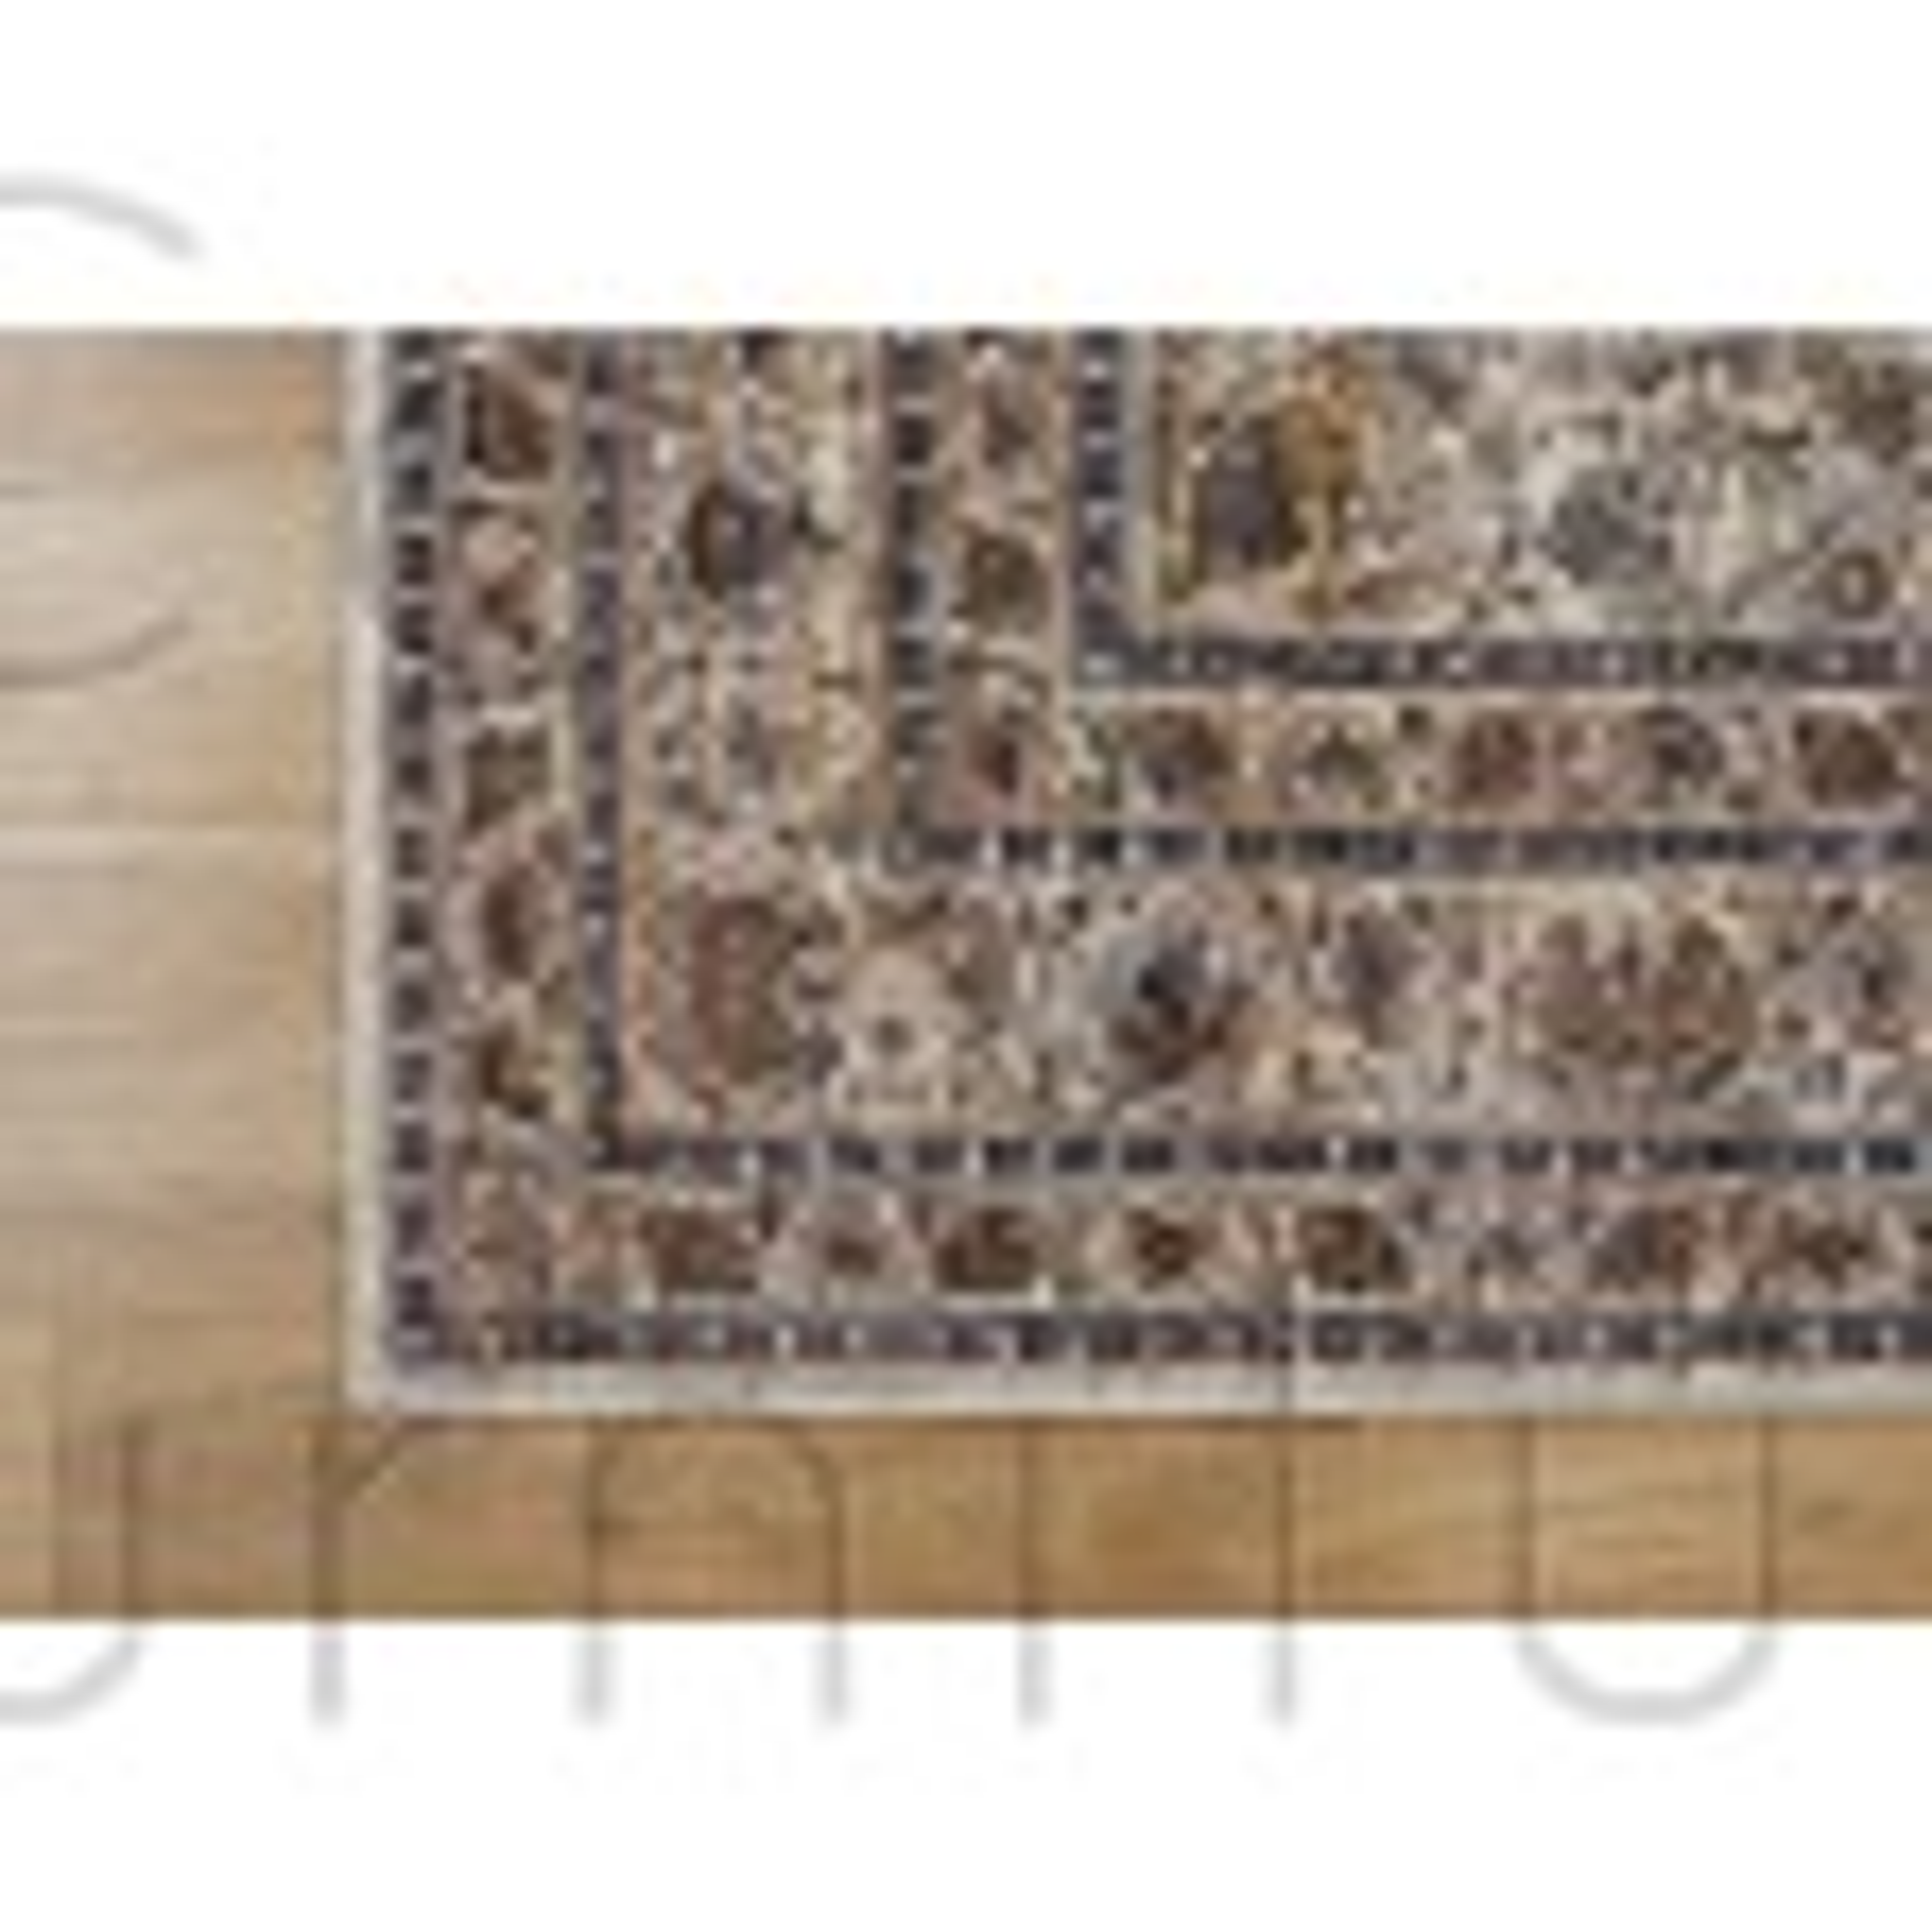 "Alhambra Traditional Rug - 6345c ivory/beige - Size 200 x 290 cm (6'7"" x 9'6"")"